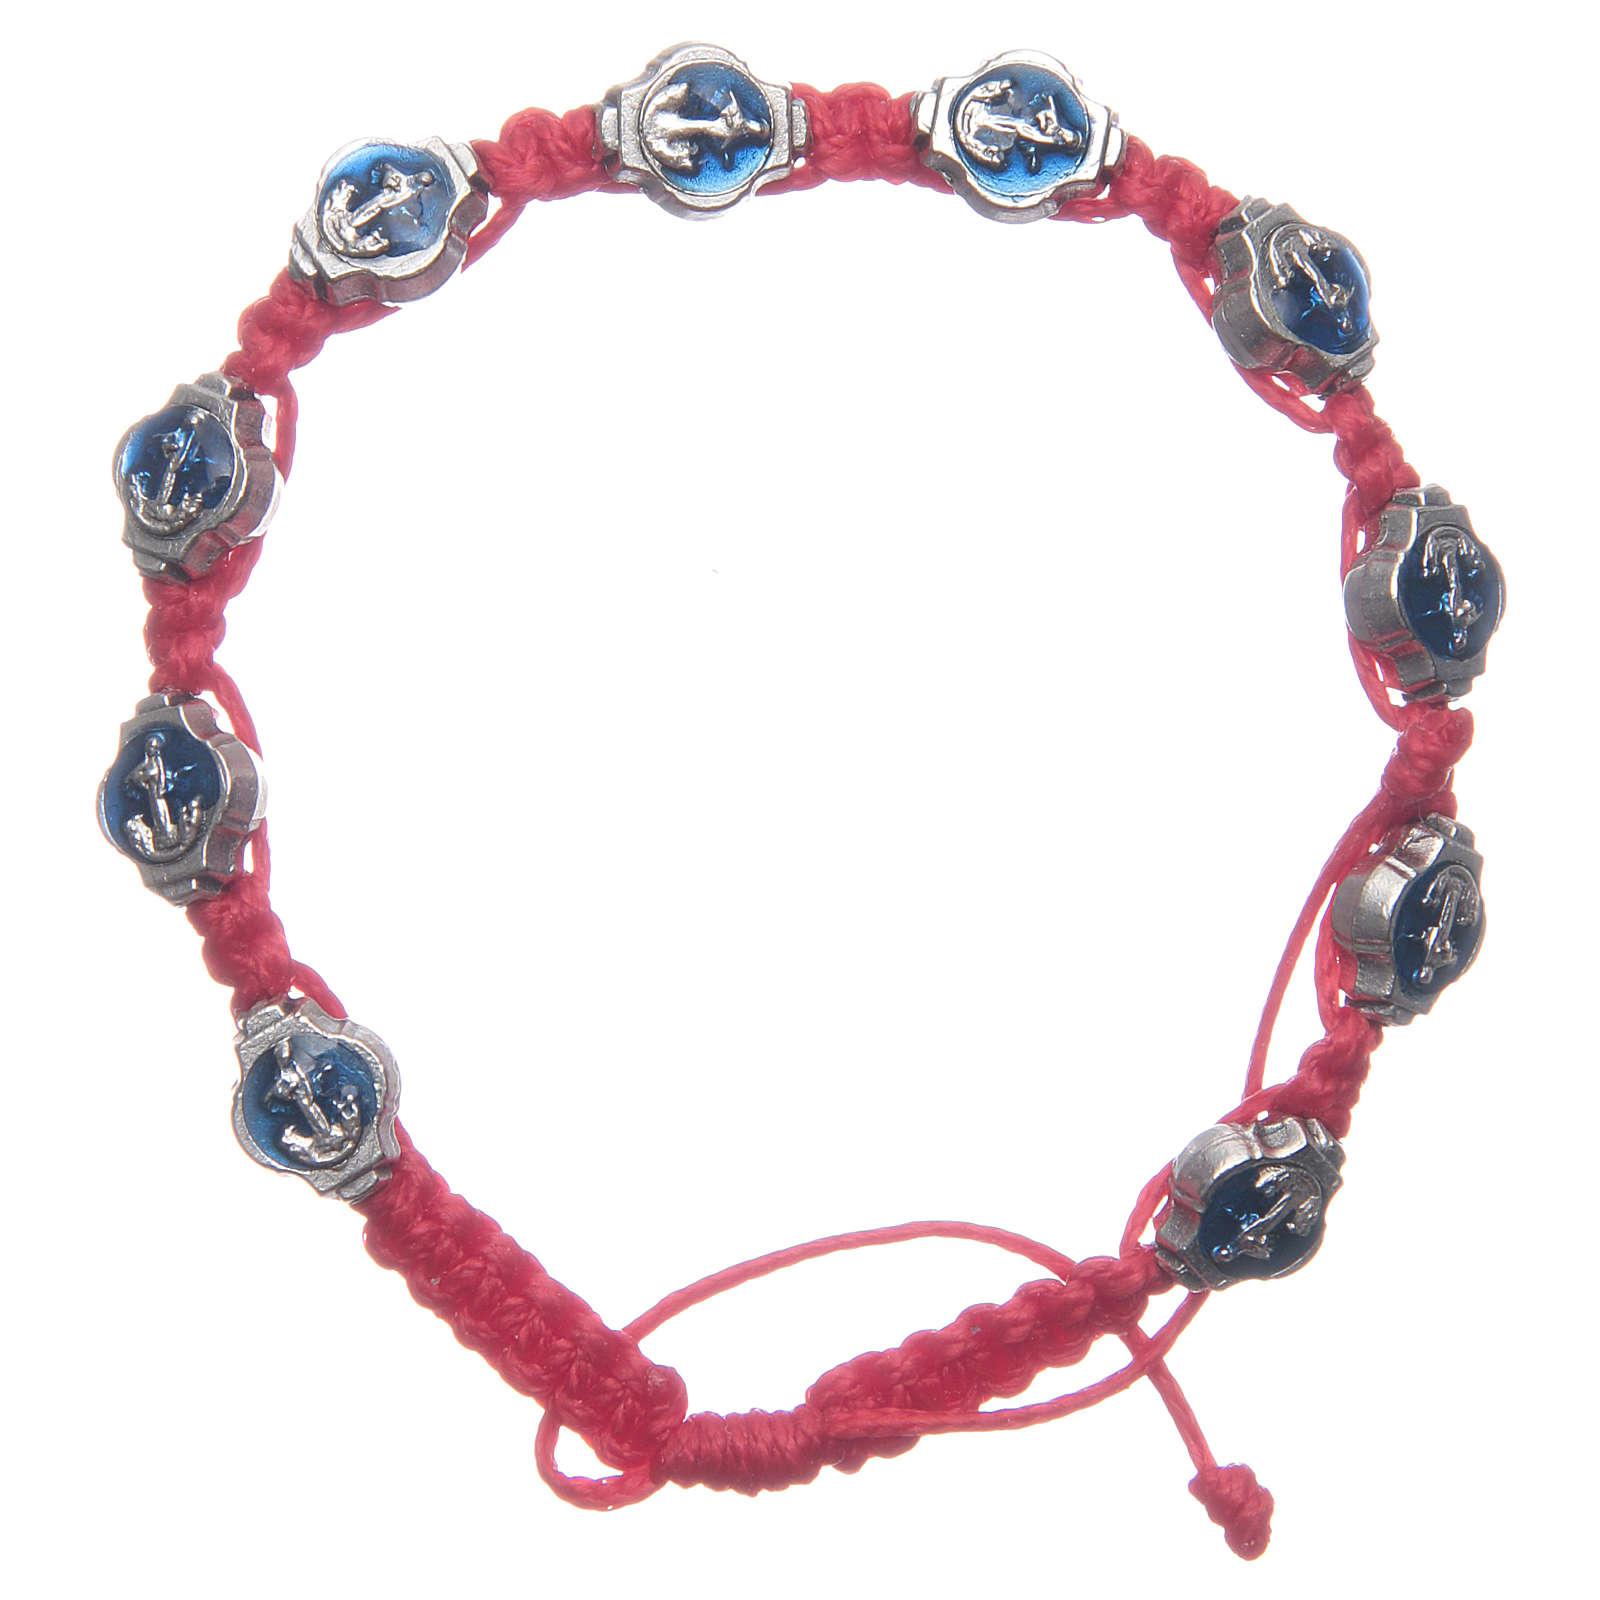 Braccialetto Medjugorje smalti blu corda rossa 4